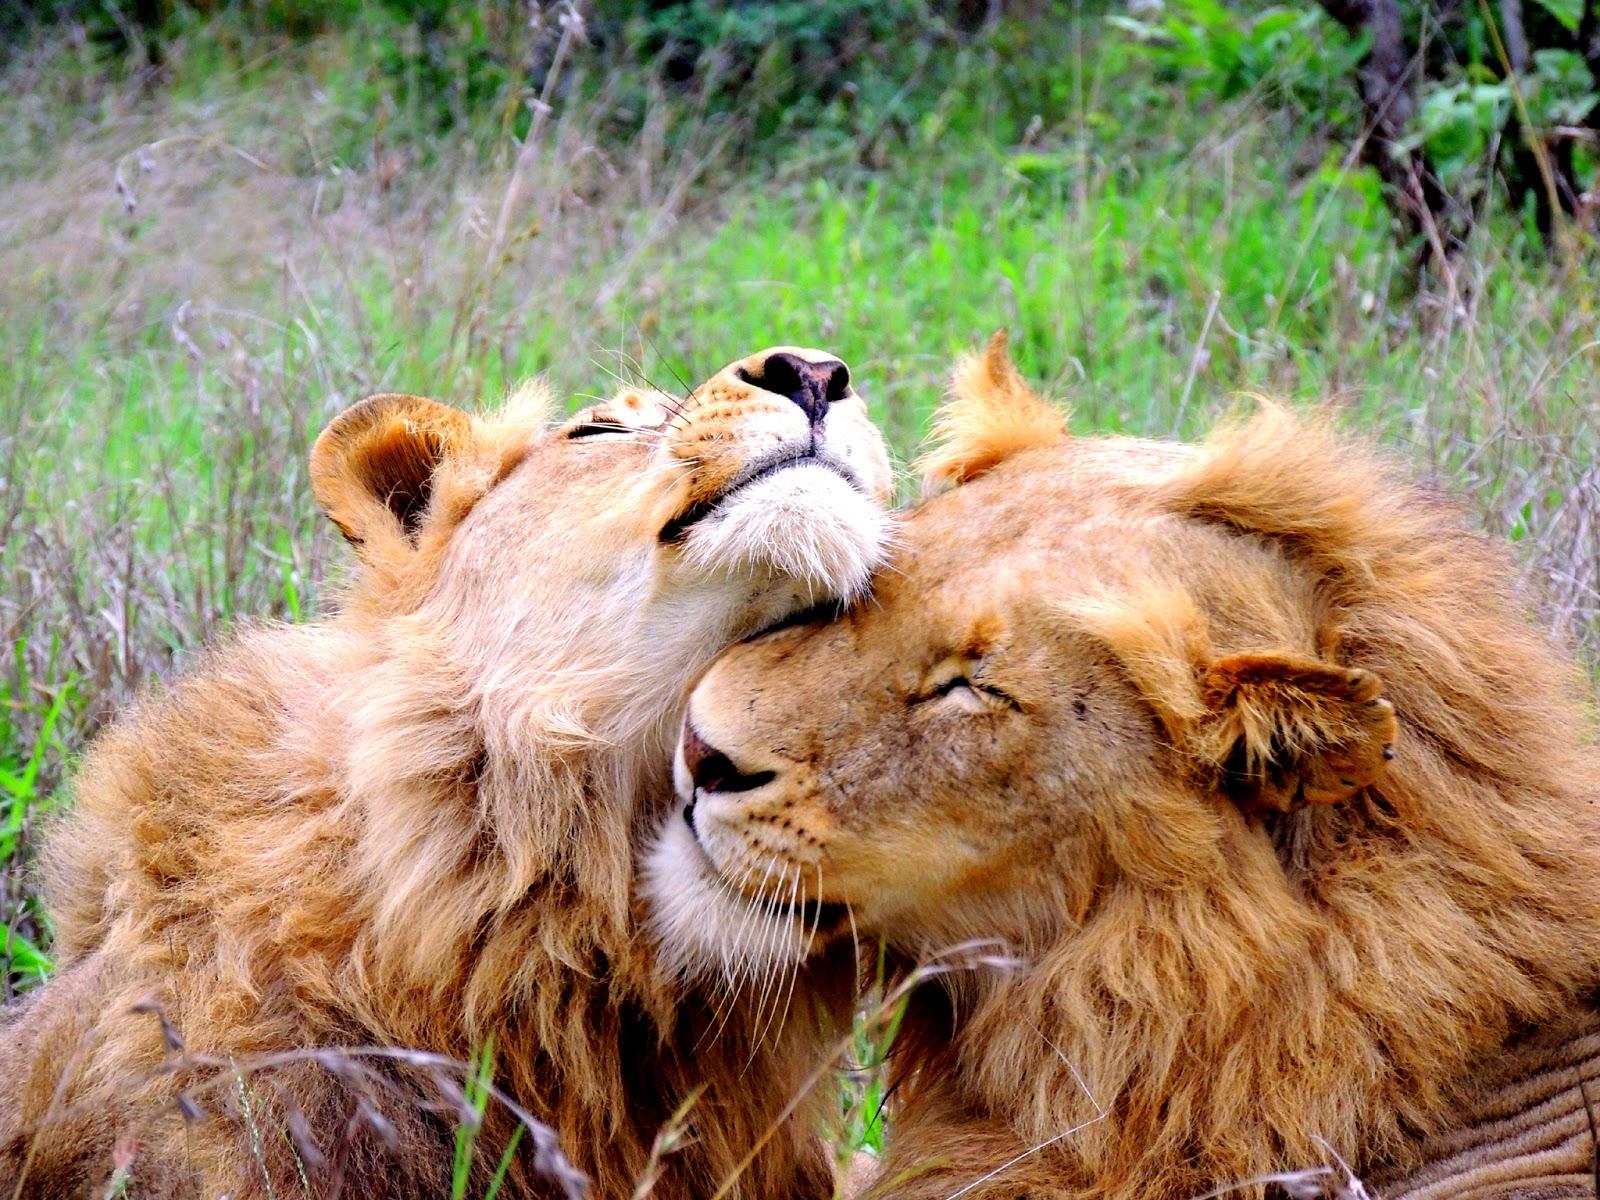 Honey badger vs lion testicles - photo#26